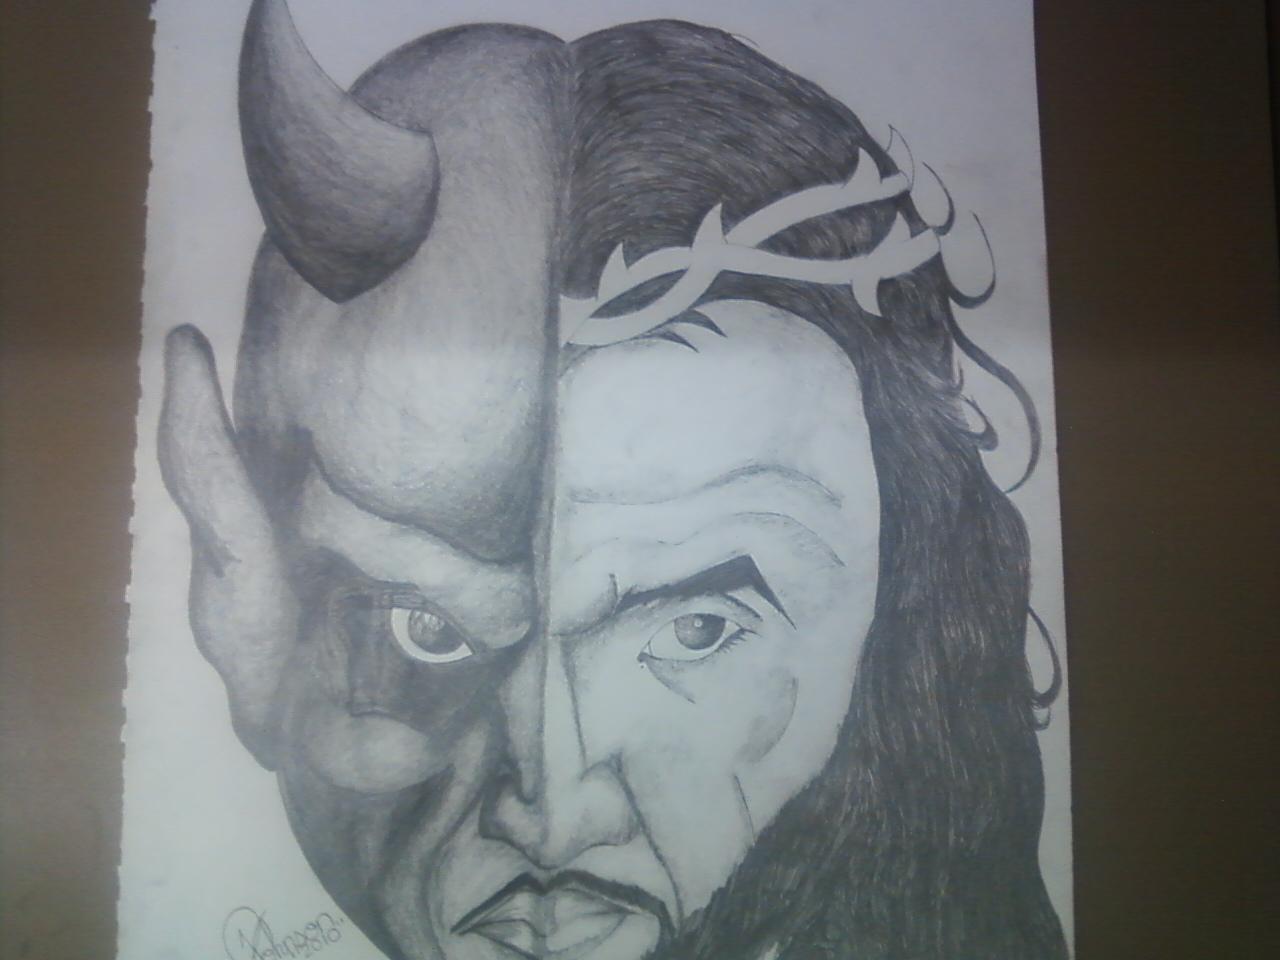 1280x960 Evil Pencil Drawings Good Vs Evil